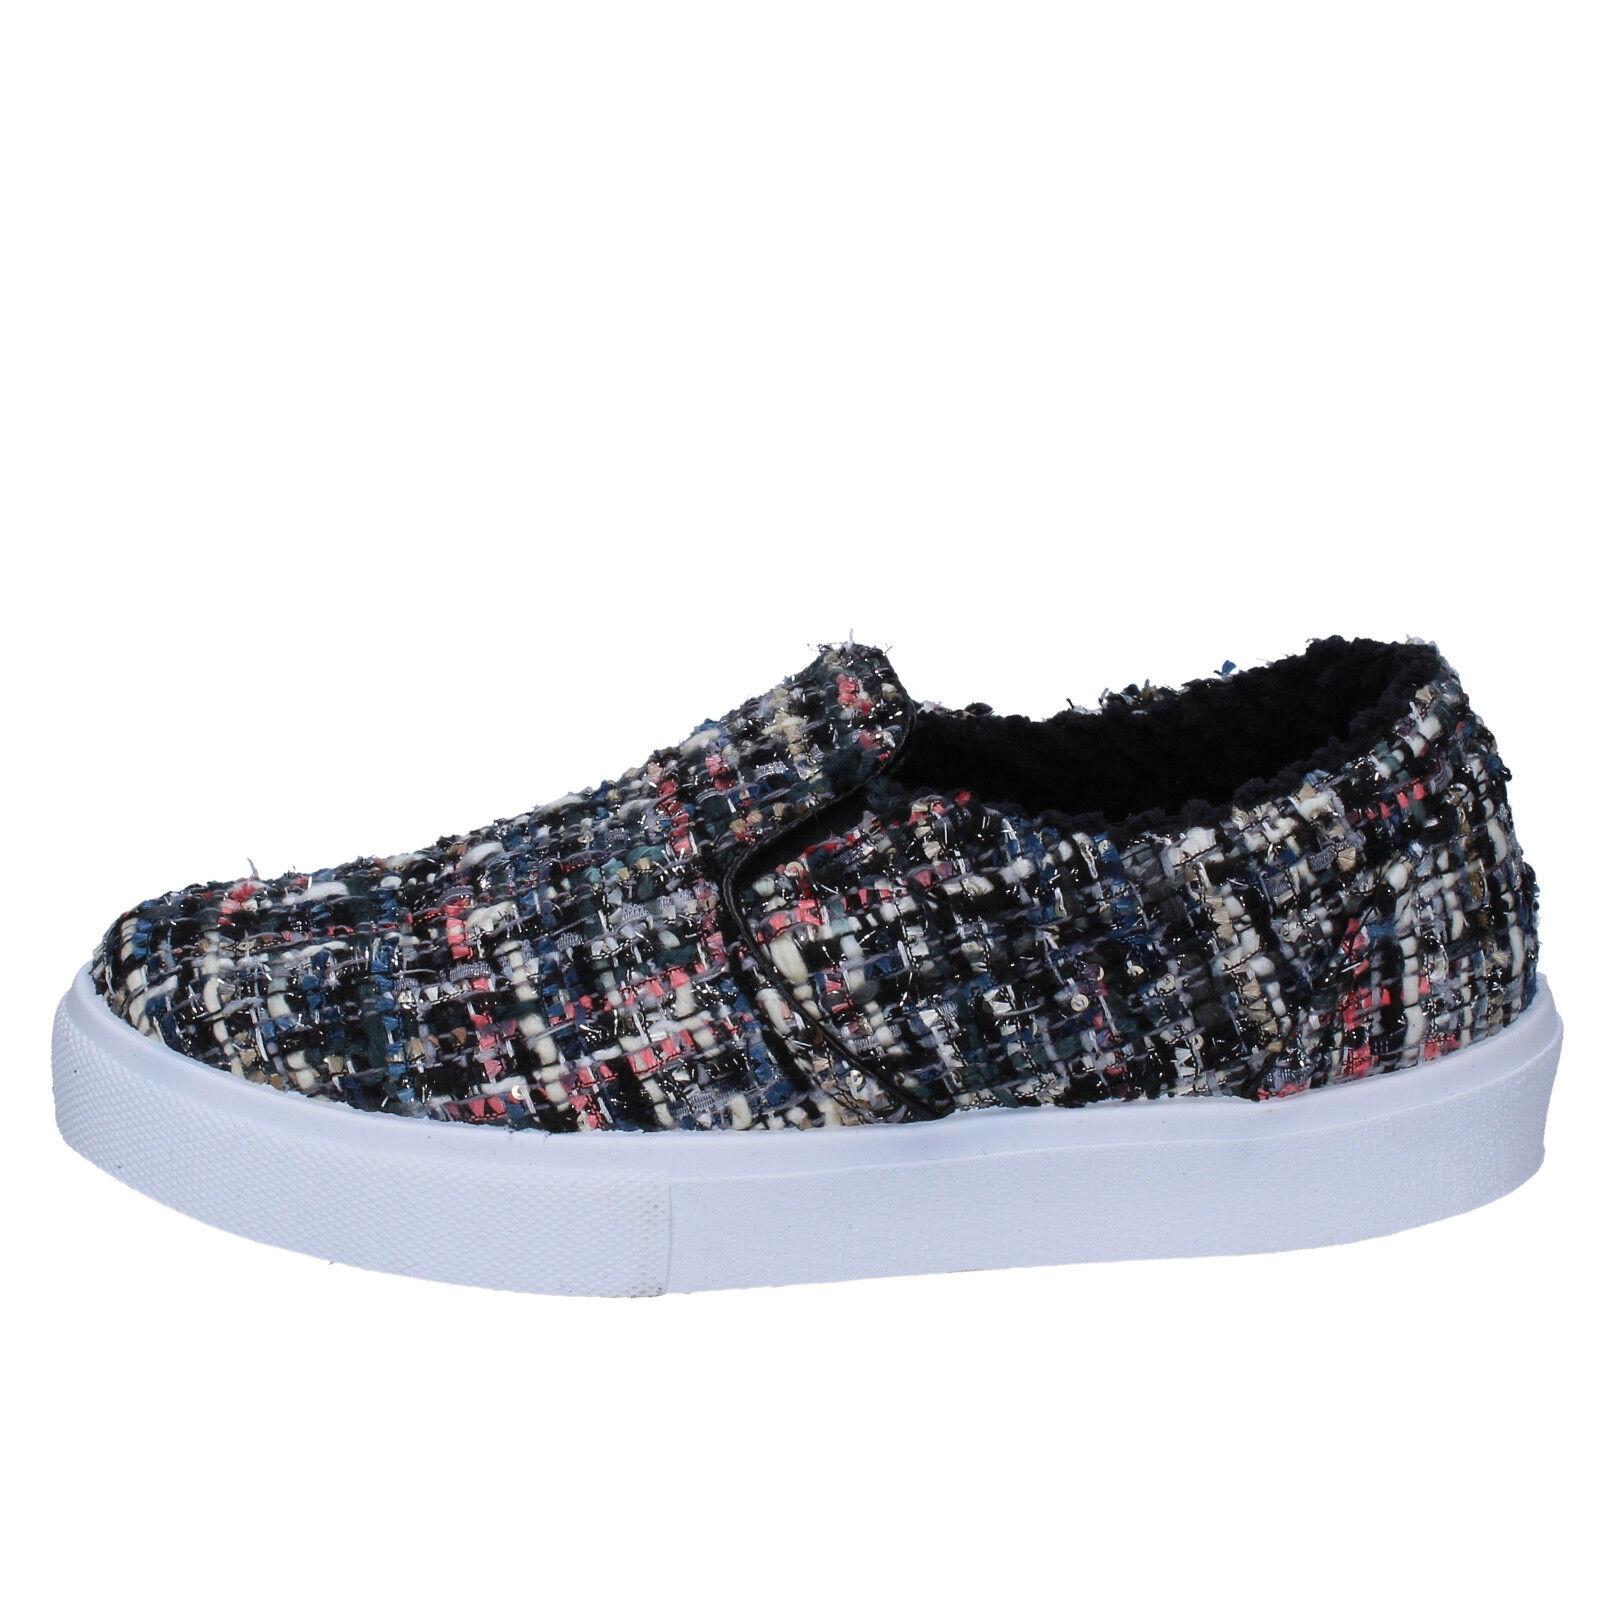 Zapatos para mujer 2 estrellas 5 (EU (EU (EU 38) Slip On MultiColor textil BX381  buena reputación